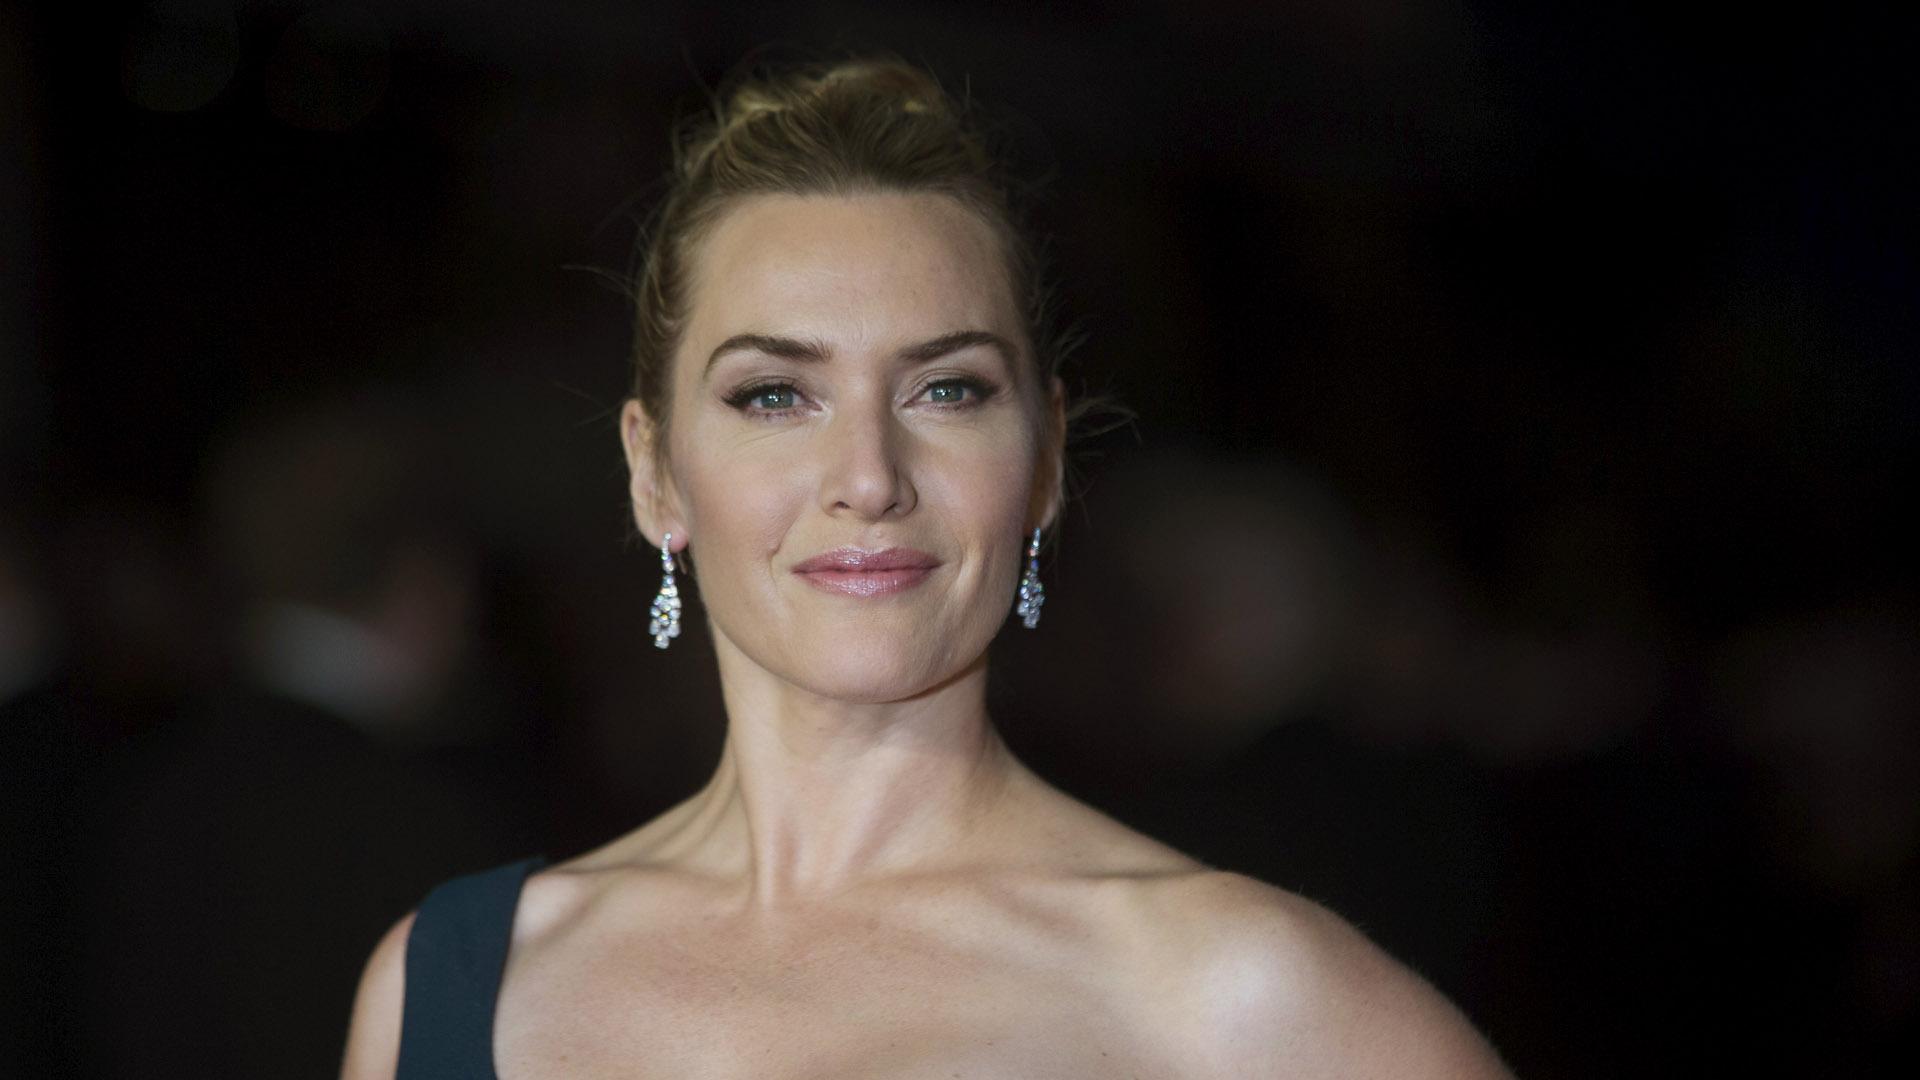 Kate Winslet Images